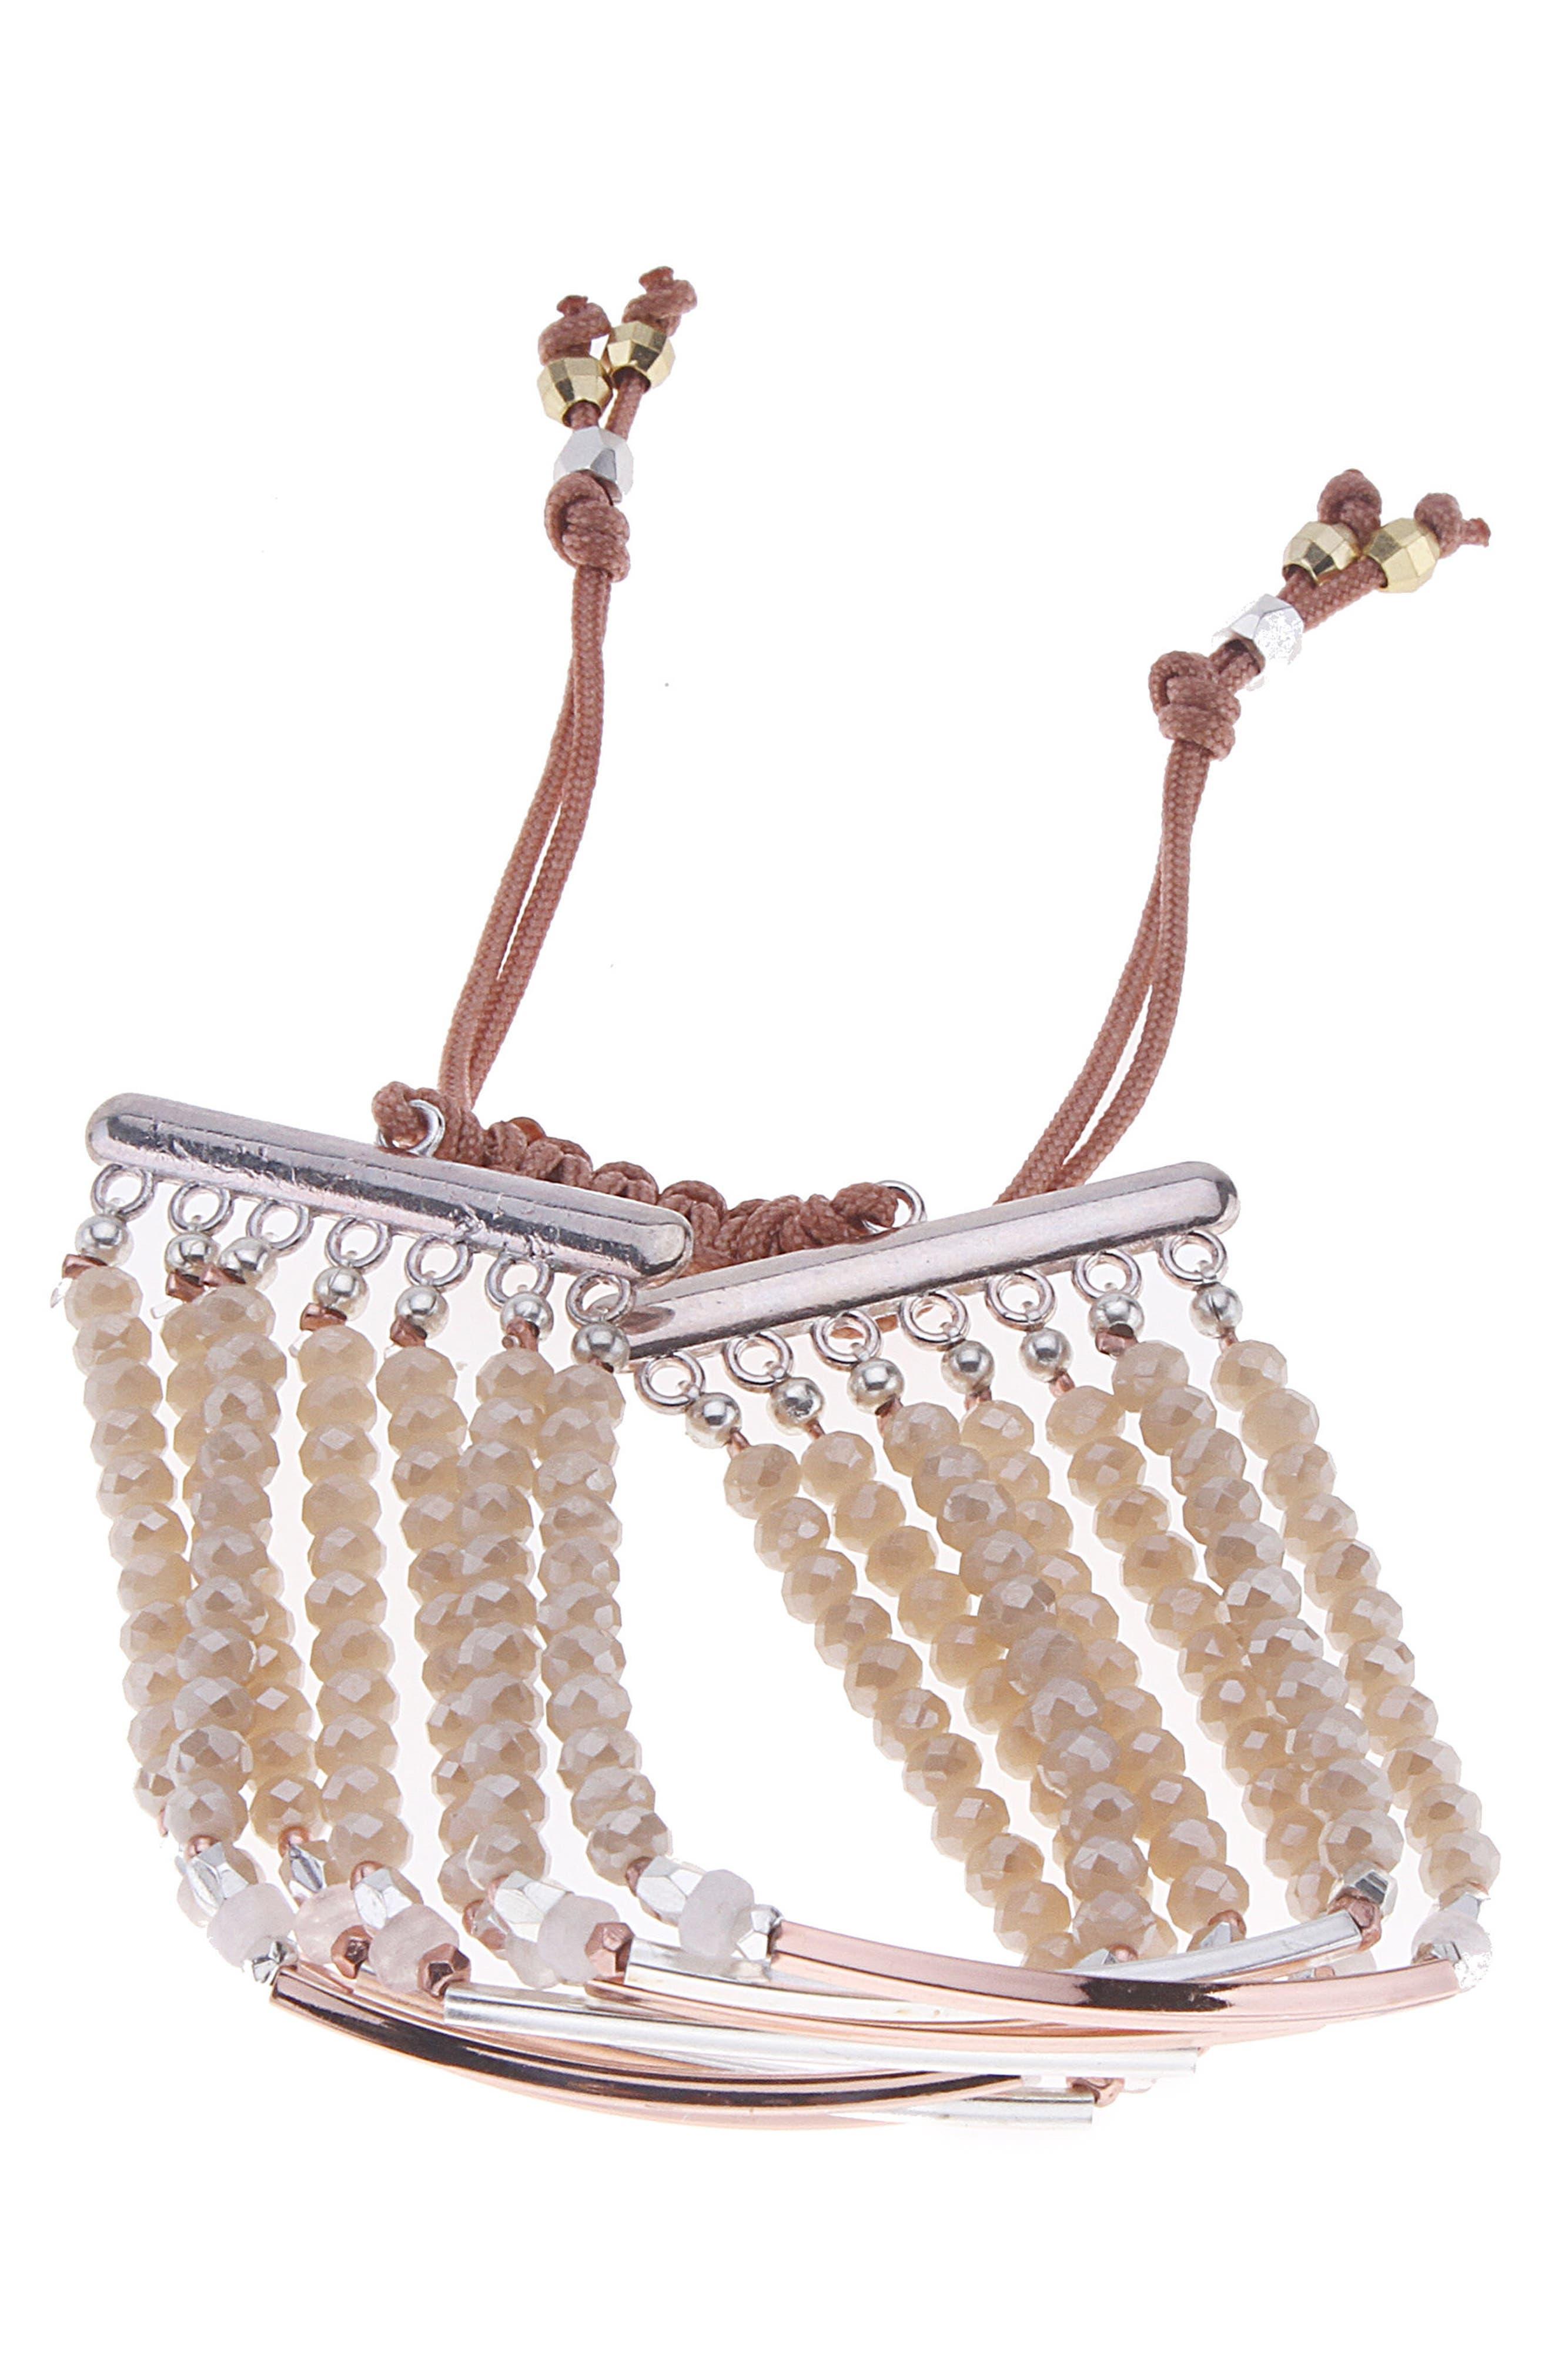 Bar Charm & Beaded Bracelet,                             Main thumbnail 1, color,                             250